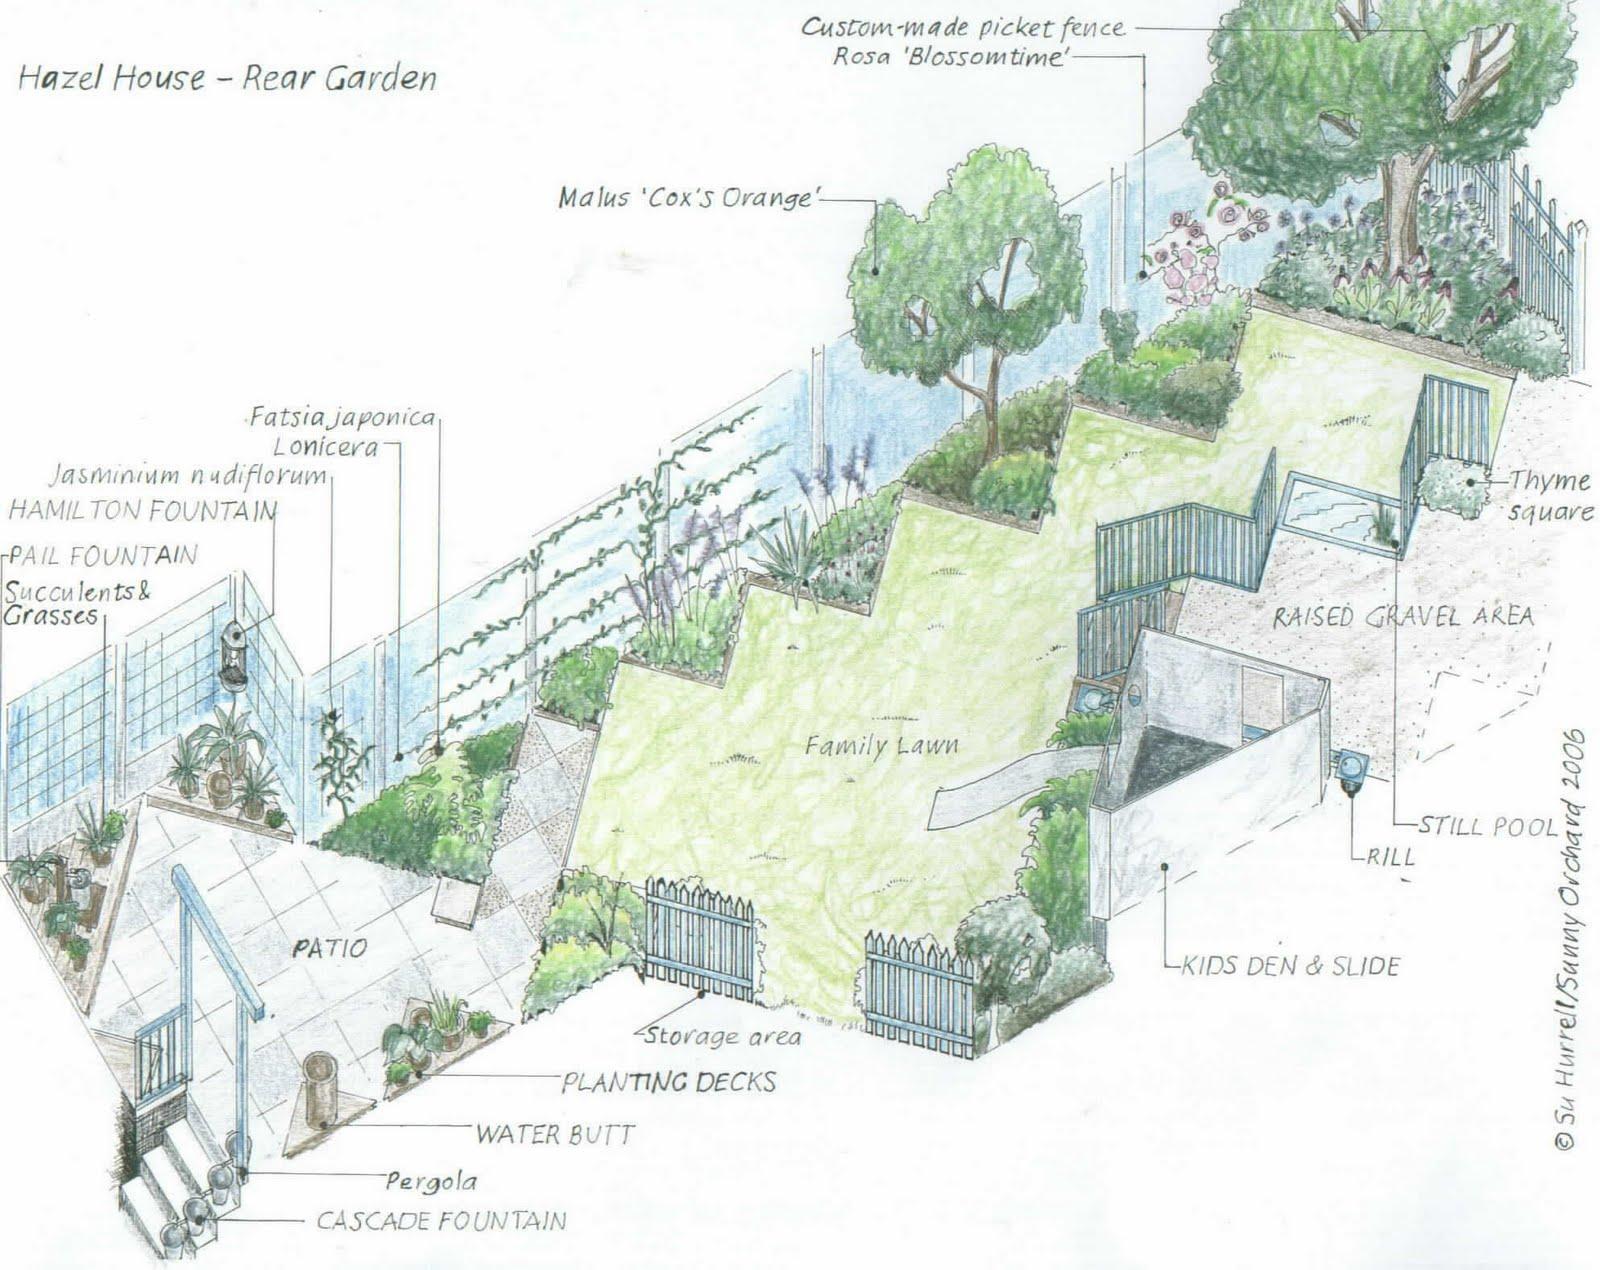 Su hurrell garden artist garden drawing 2006 for Garden design drawing